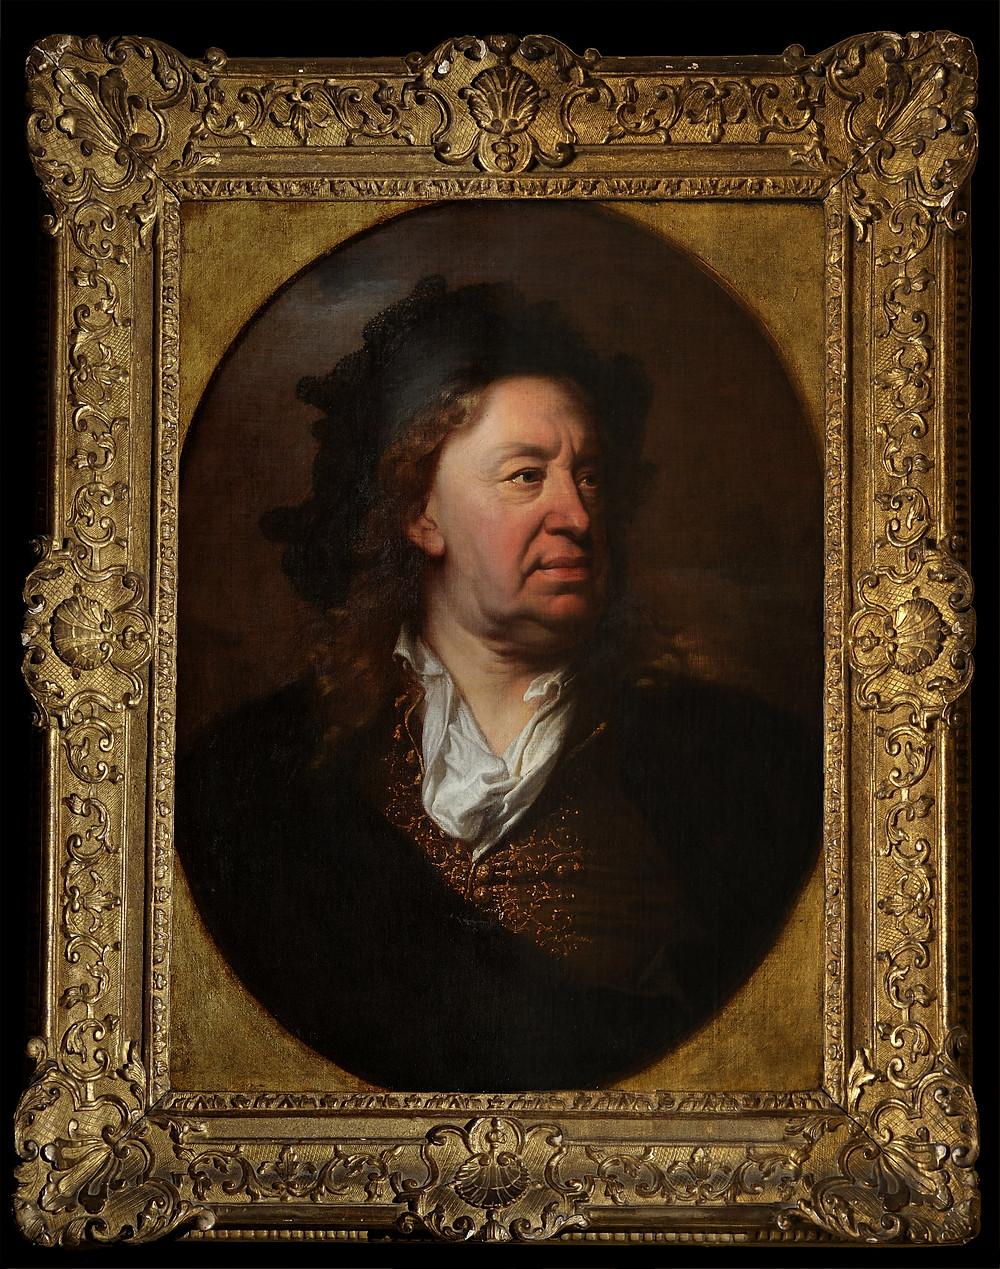 Hyacinthe Rigaud, Portrait d'Everhard Jabach, vers 1688, collection particulière